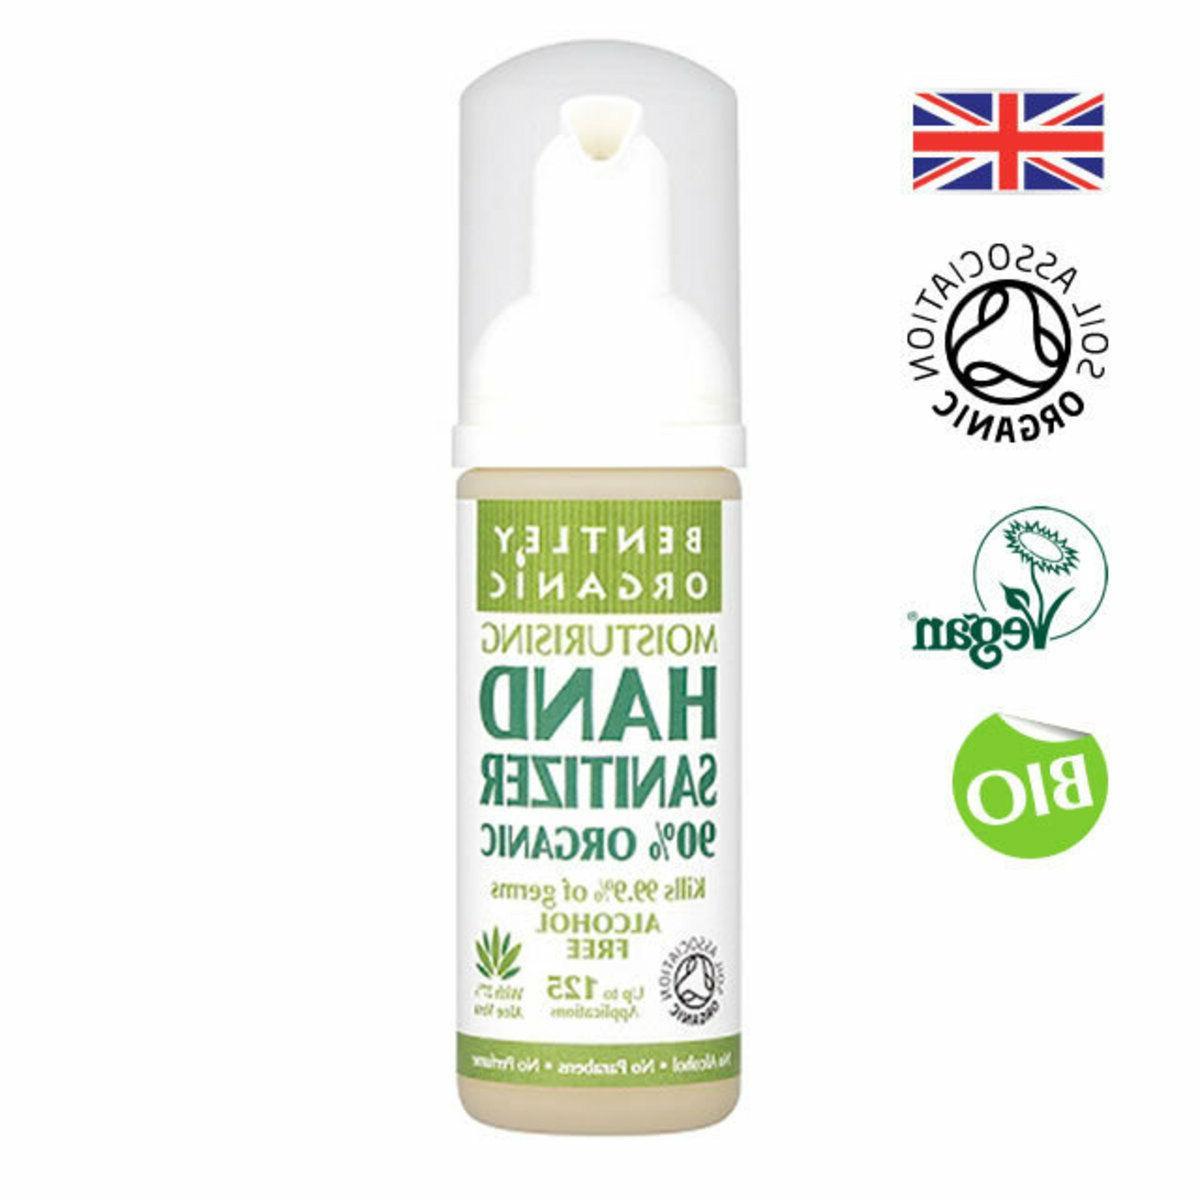 Pack 3 Moisturising Organic Hand Sanitizer 50ml Kills 99%+ of Germs